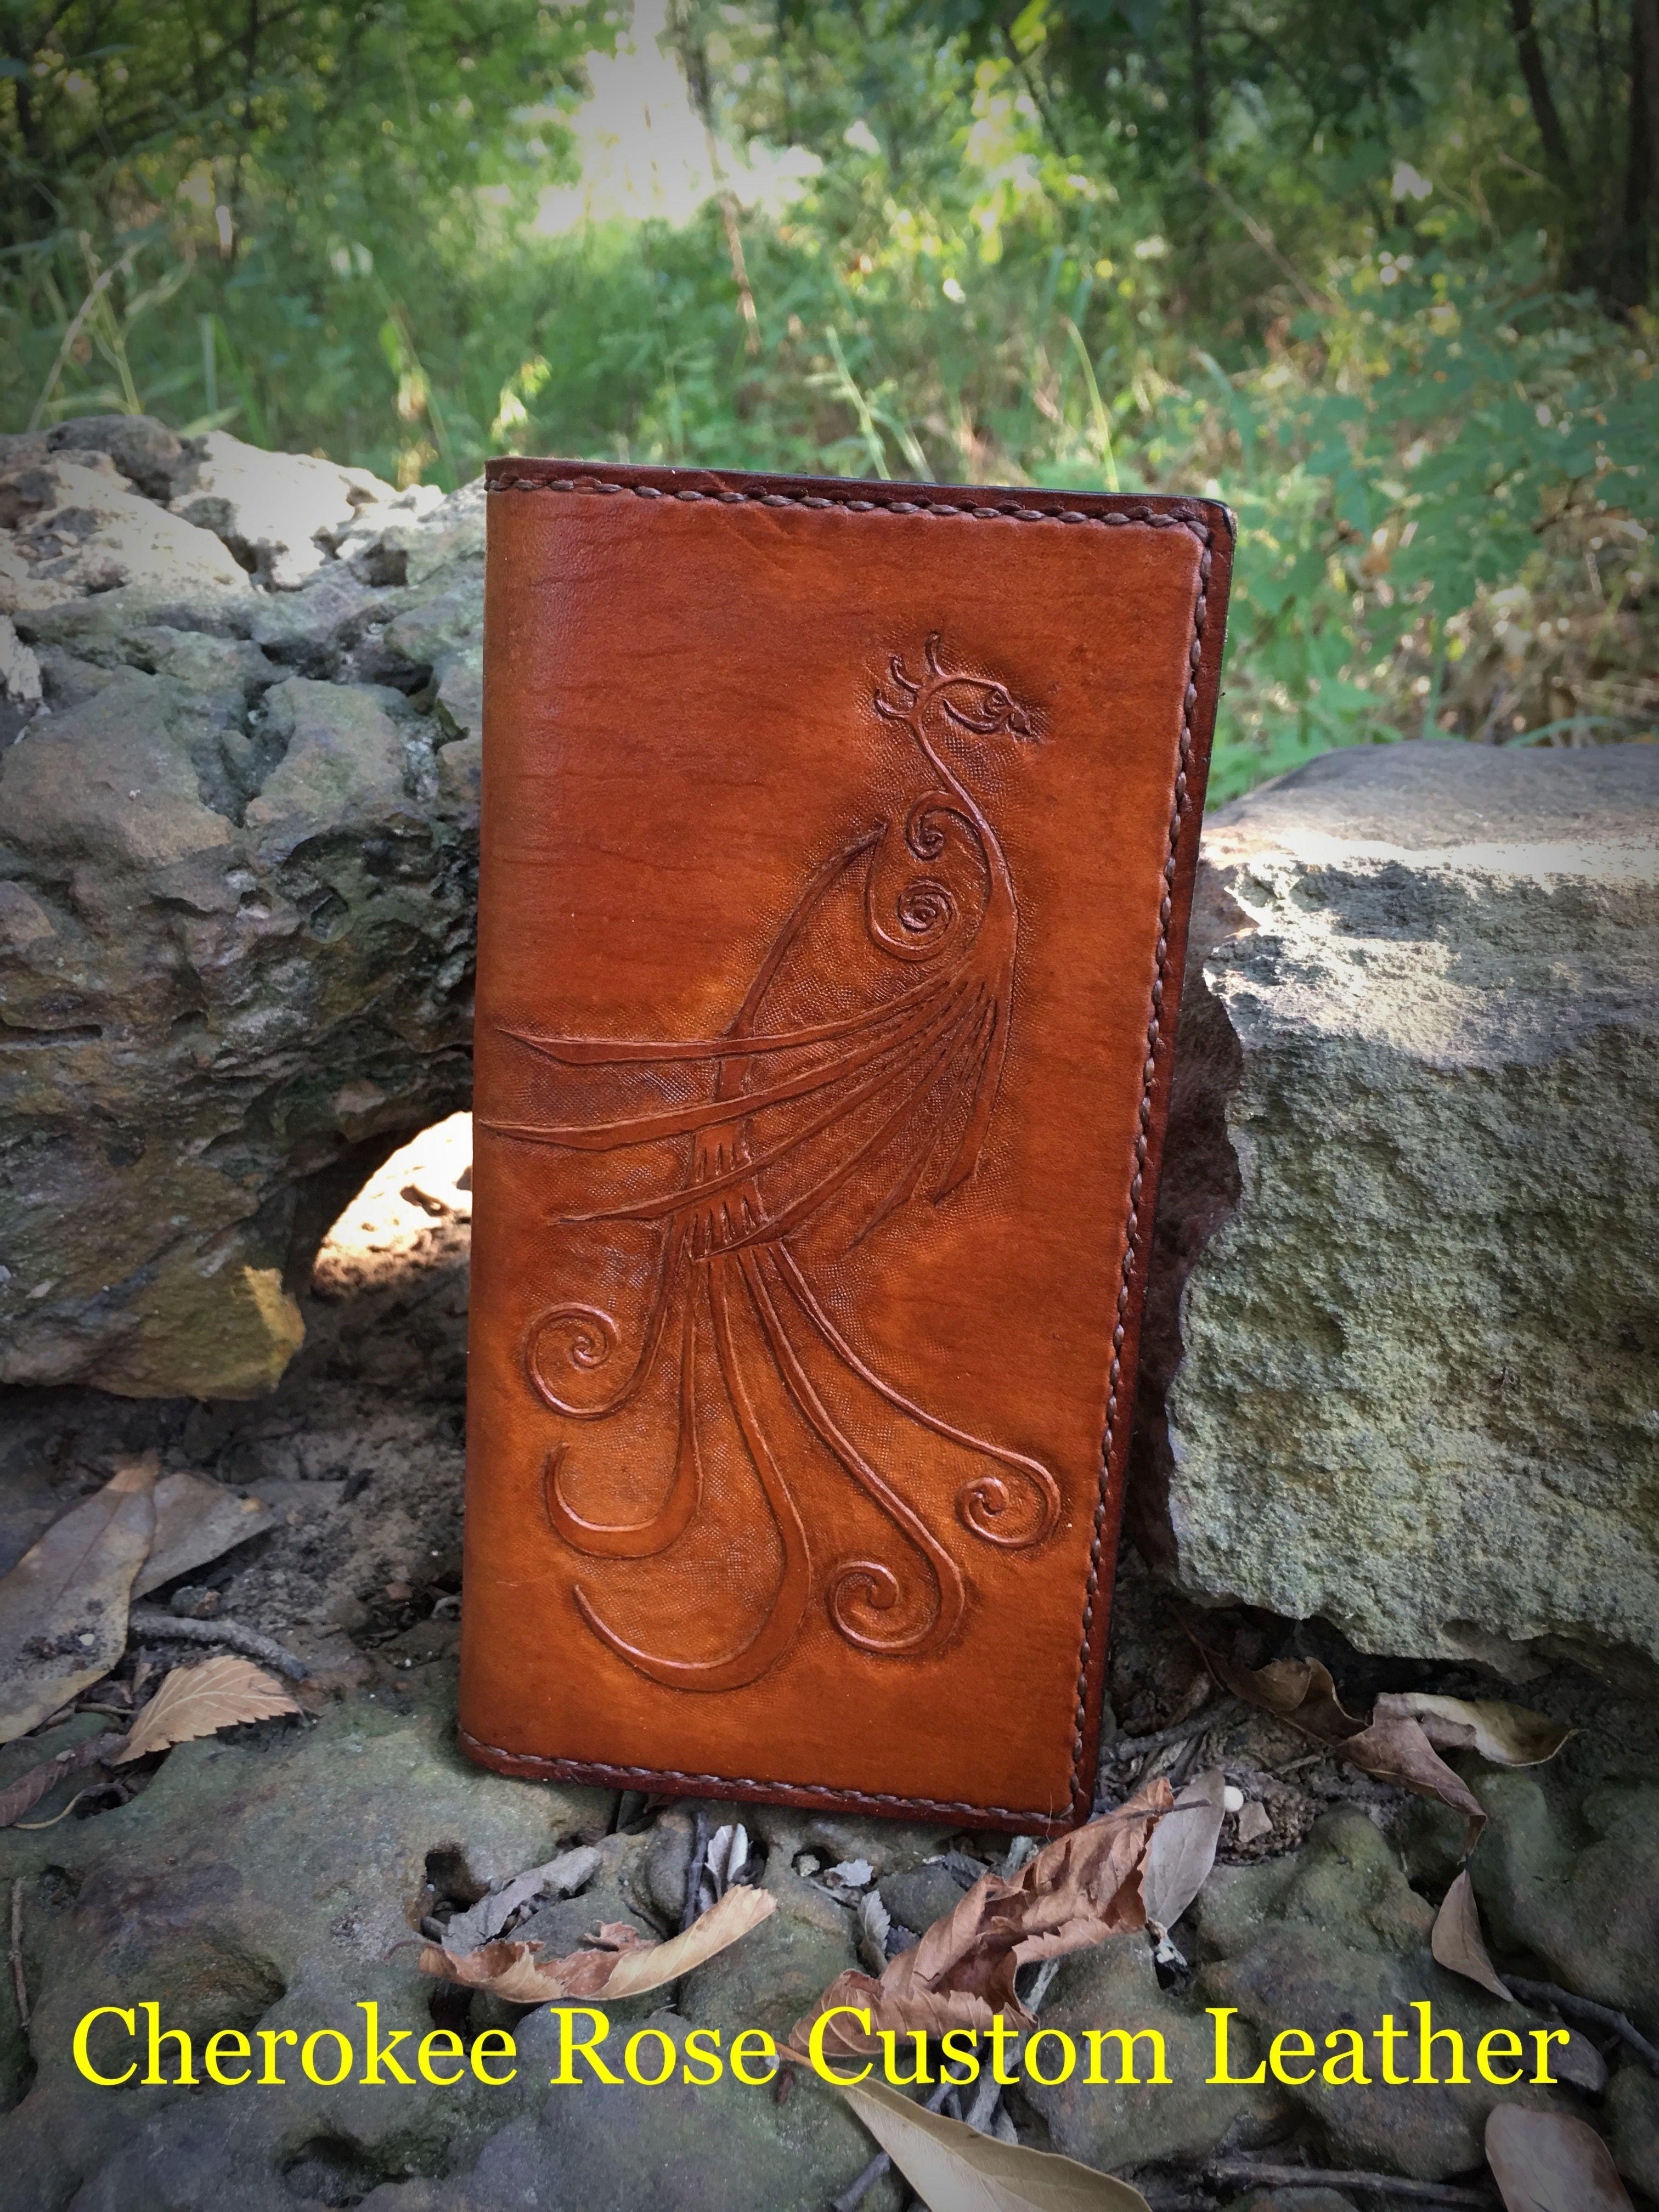 Cherokee Rose Custom Leather Handmade roper style wallet